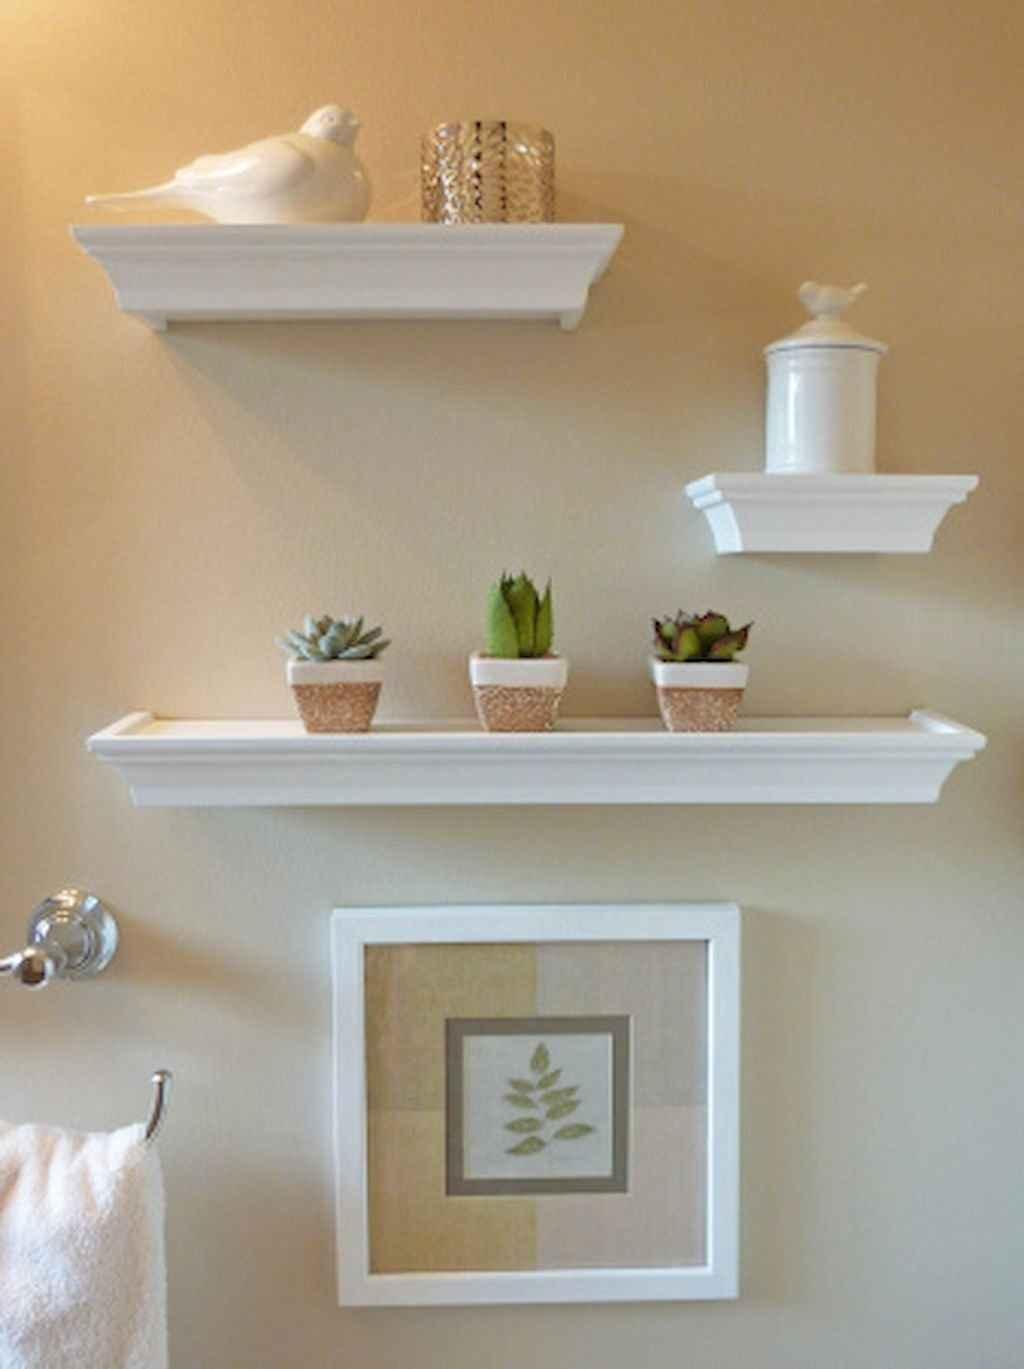 Cool bathroom storage shelves organization ideas (45)